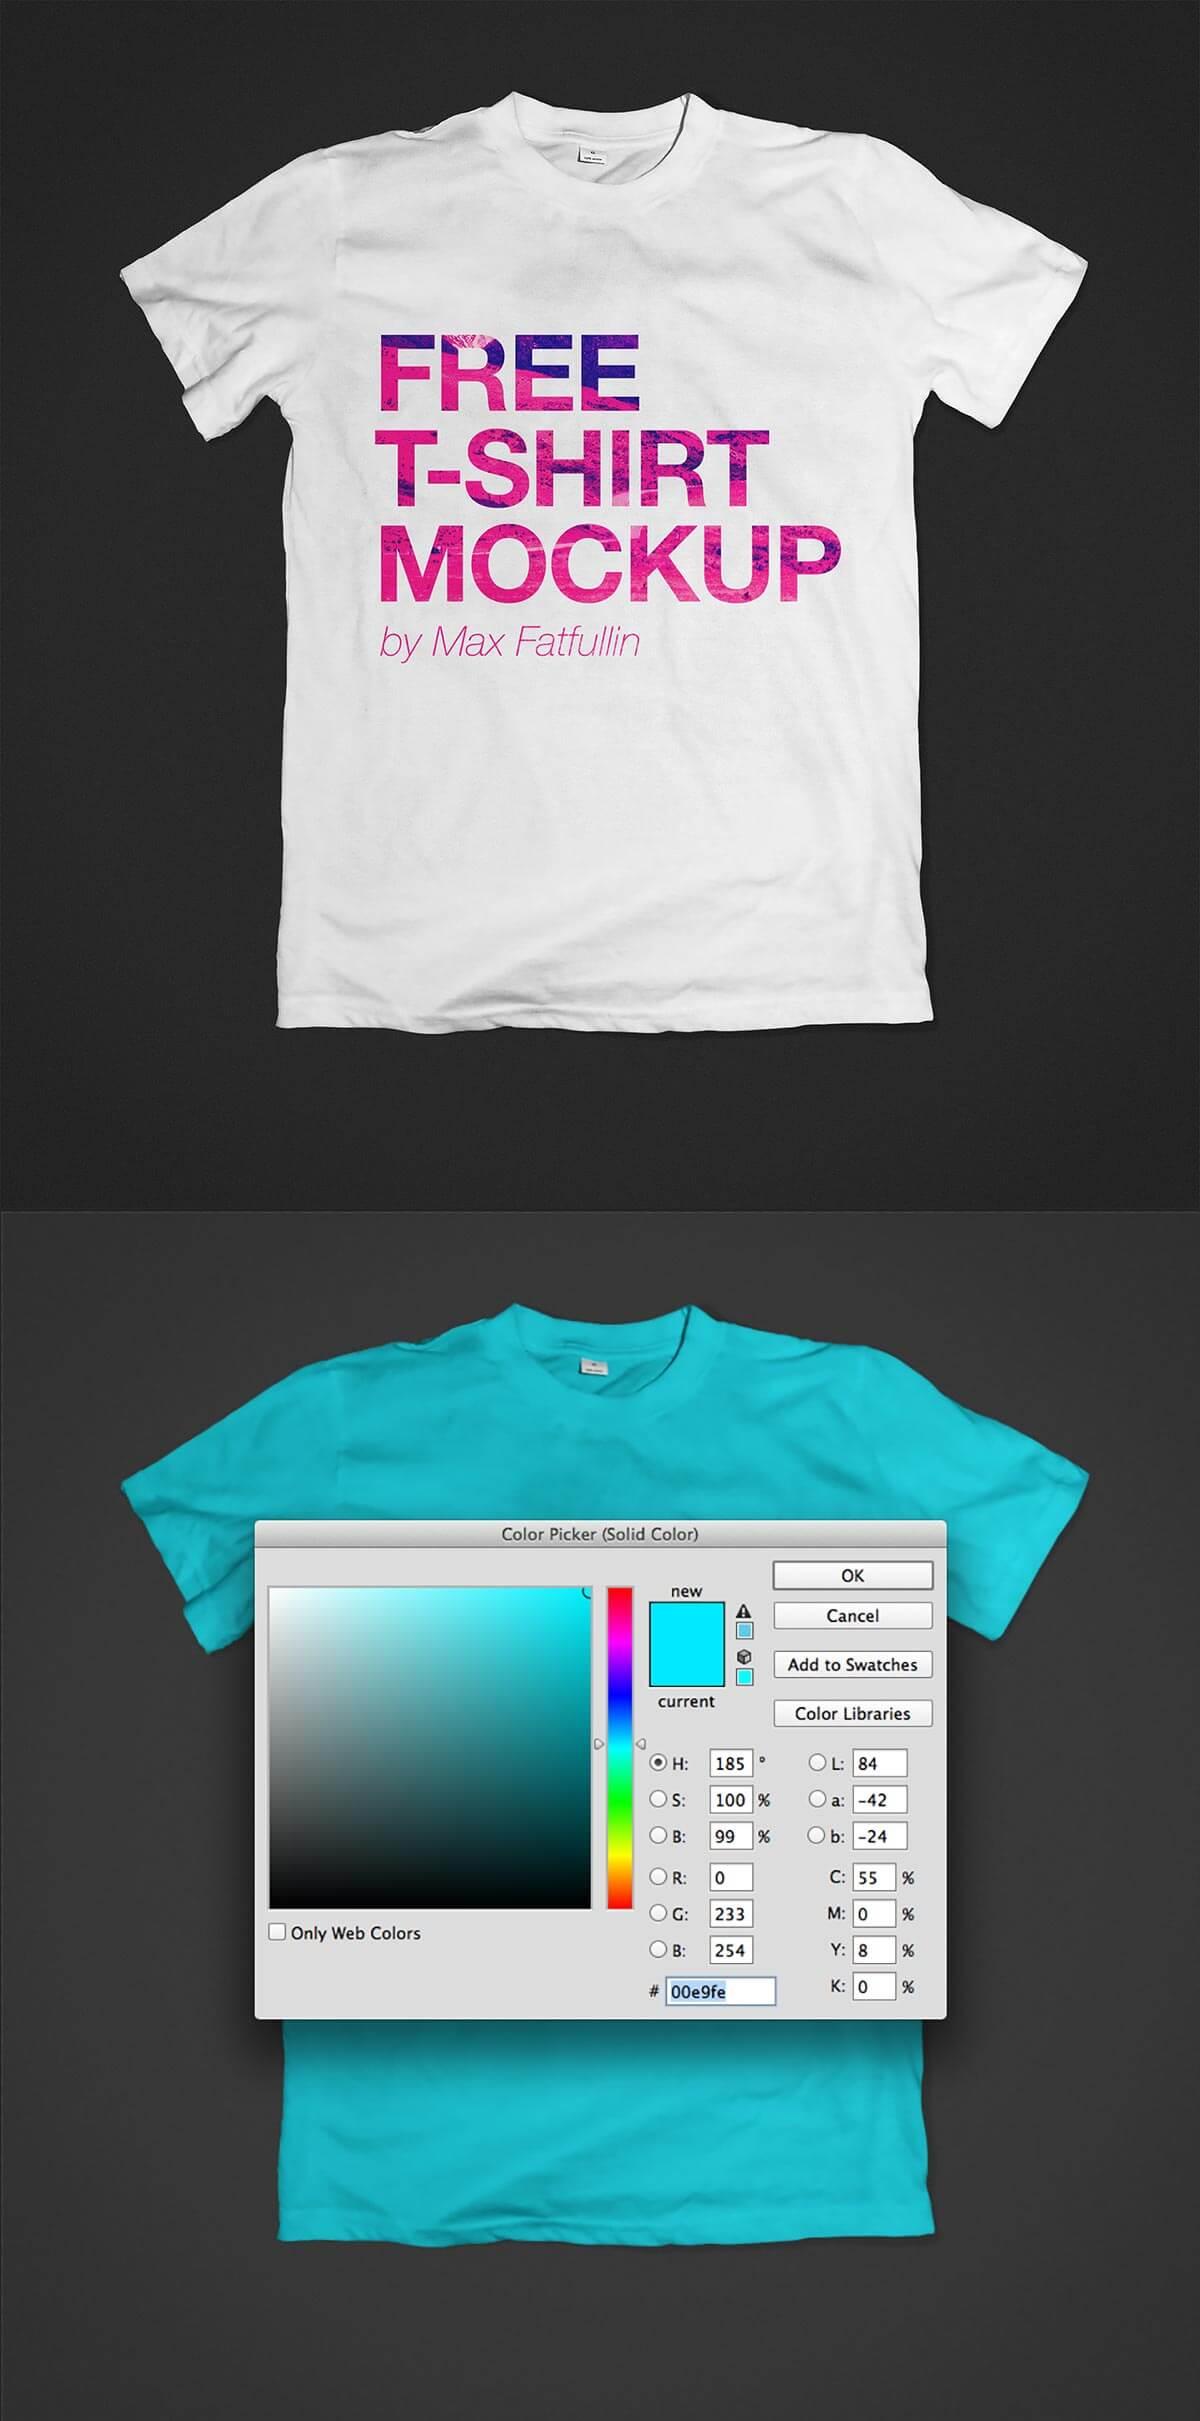 t shirt graphic design software free download - Monza berglauf